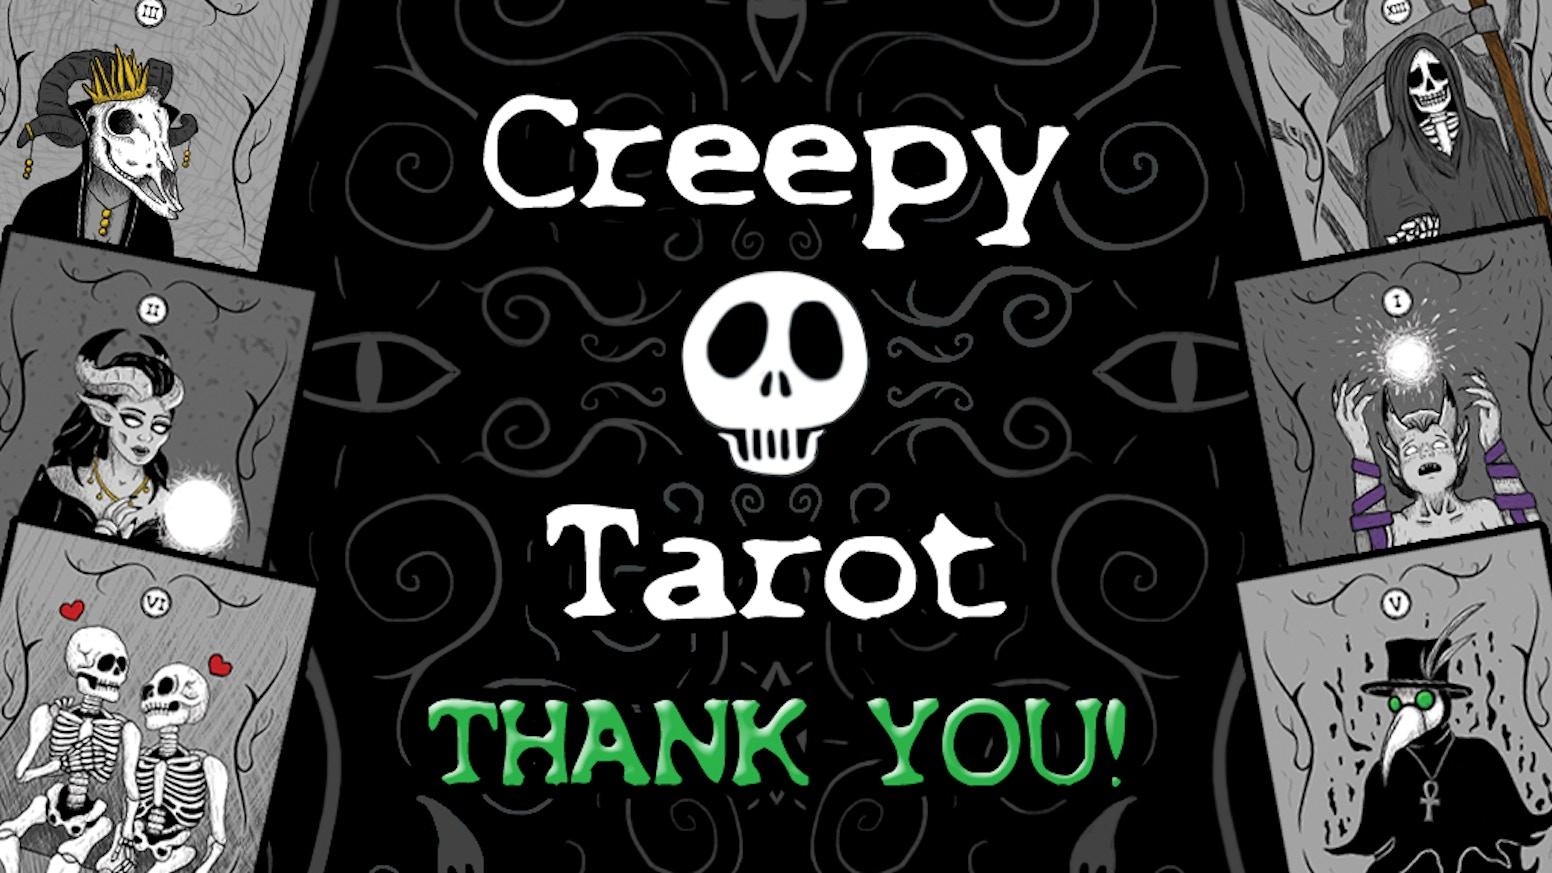 The Creepy Tarot deck is a Major Arcana deck meticulously illustrated by Stefanie Black of Creepy Kawaii.